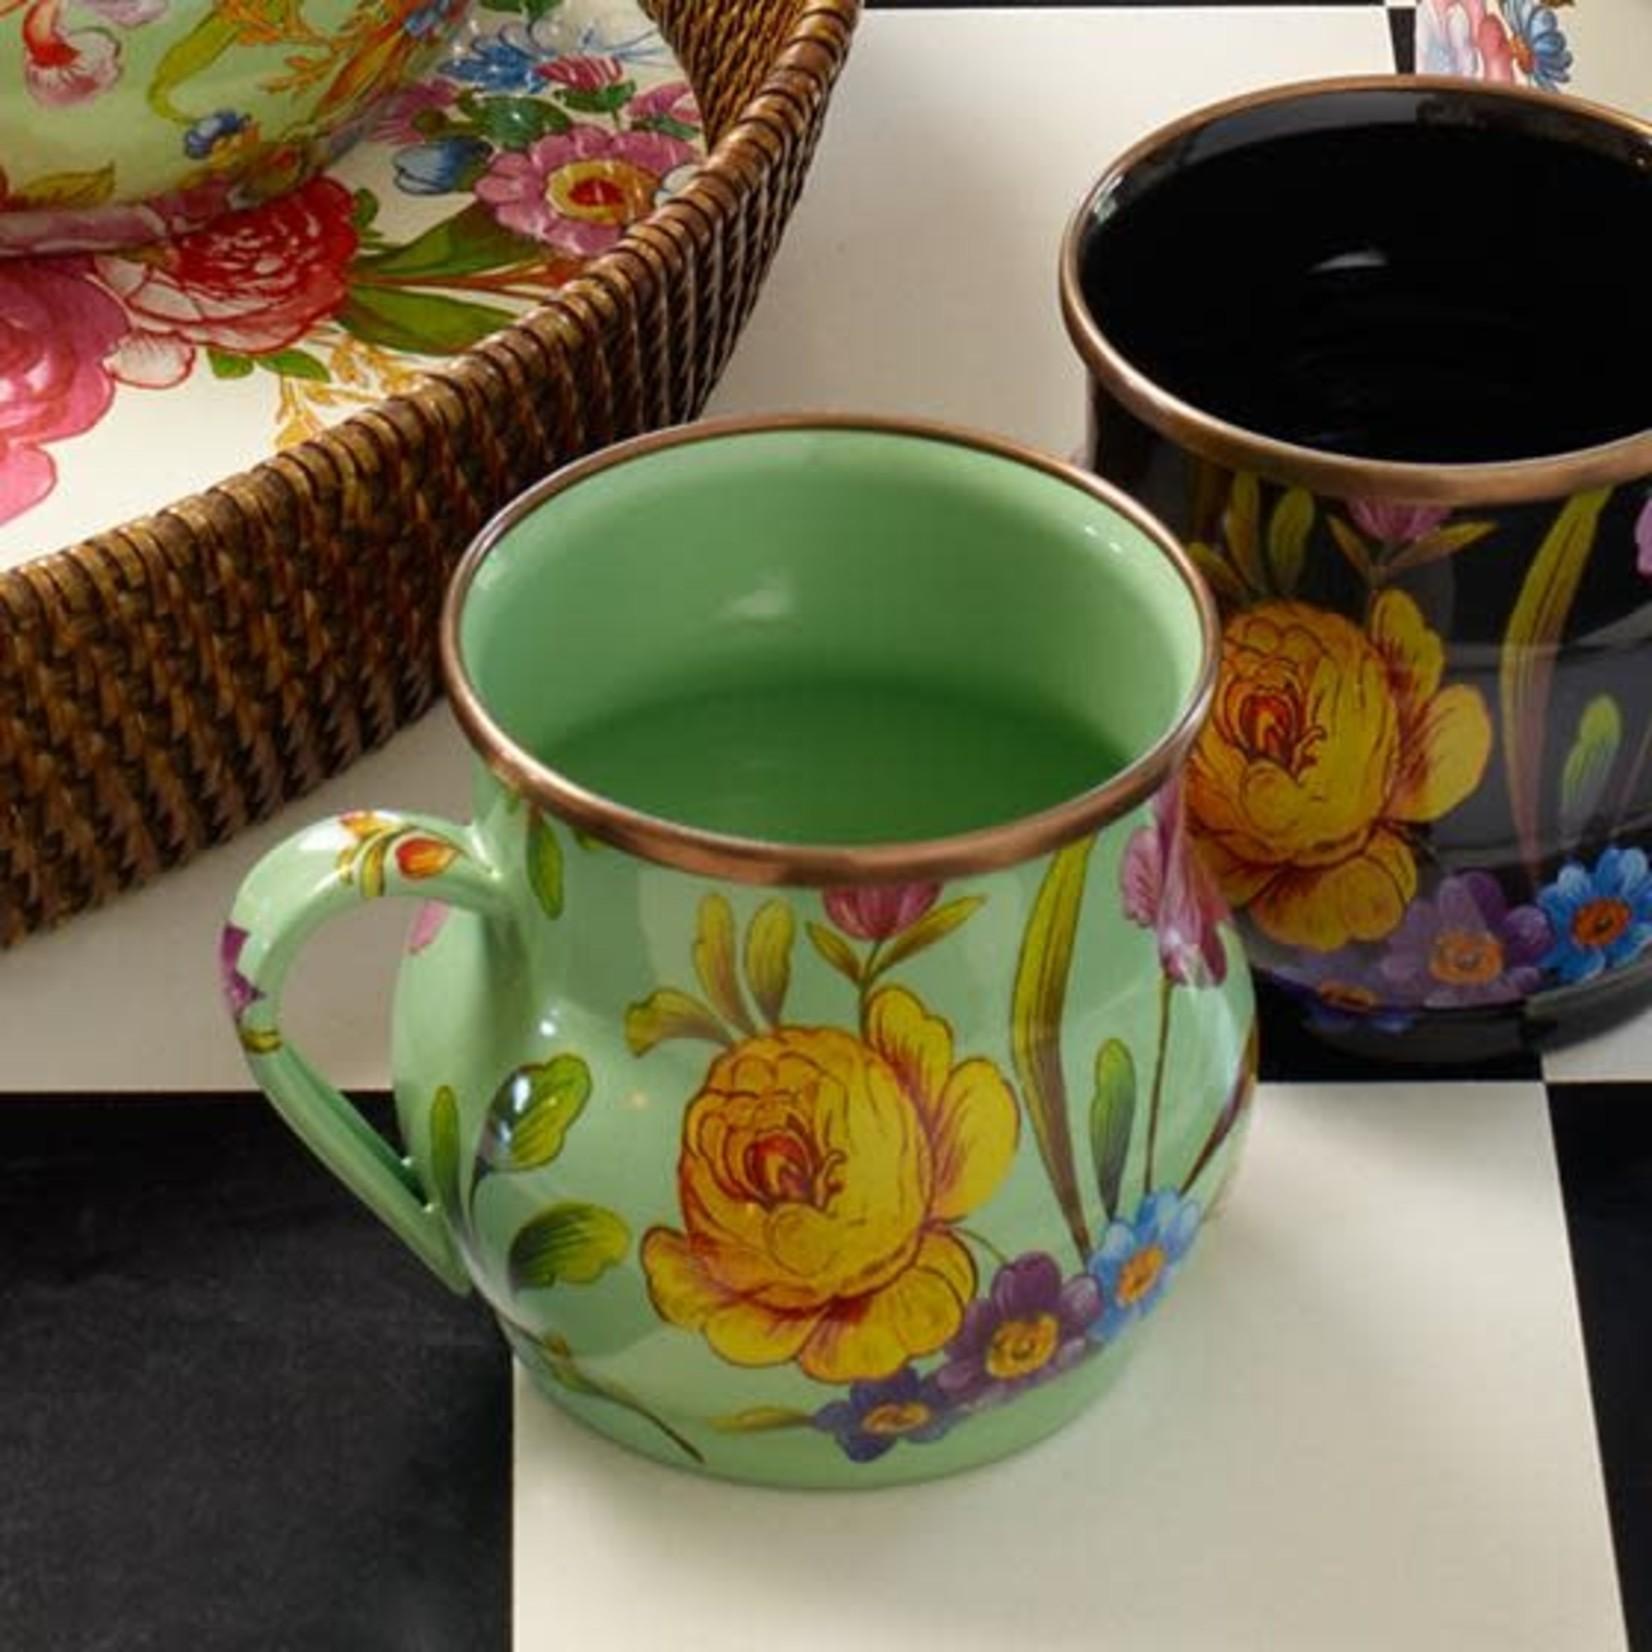 MacKenzie Childs Flower Market Mug - Green